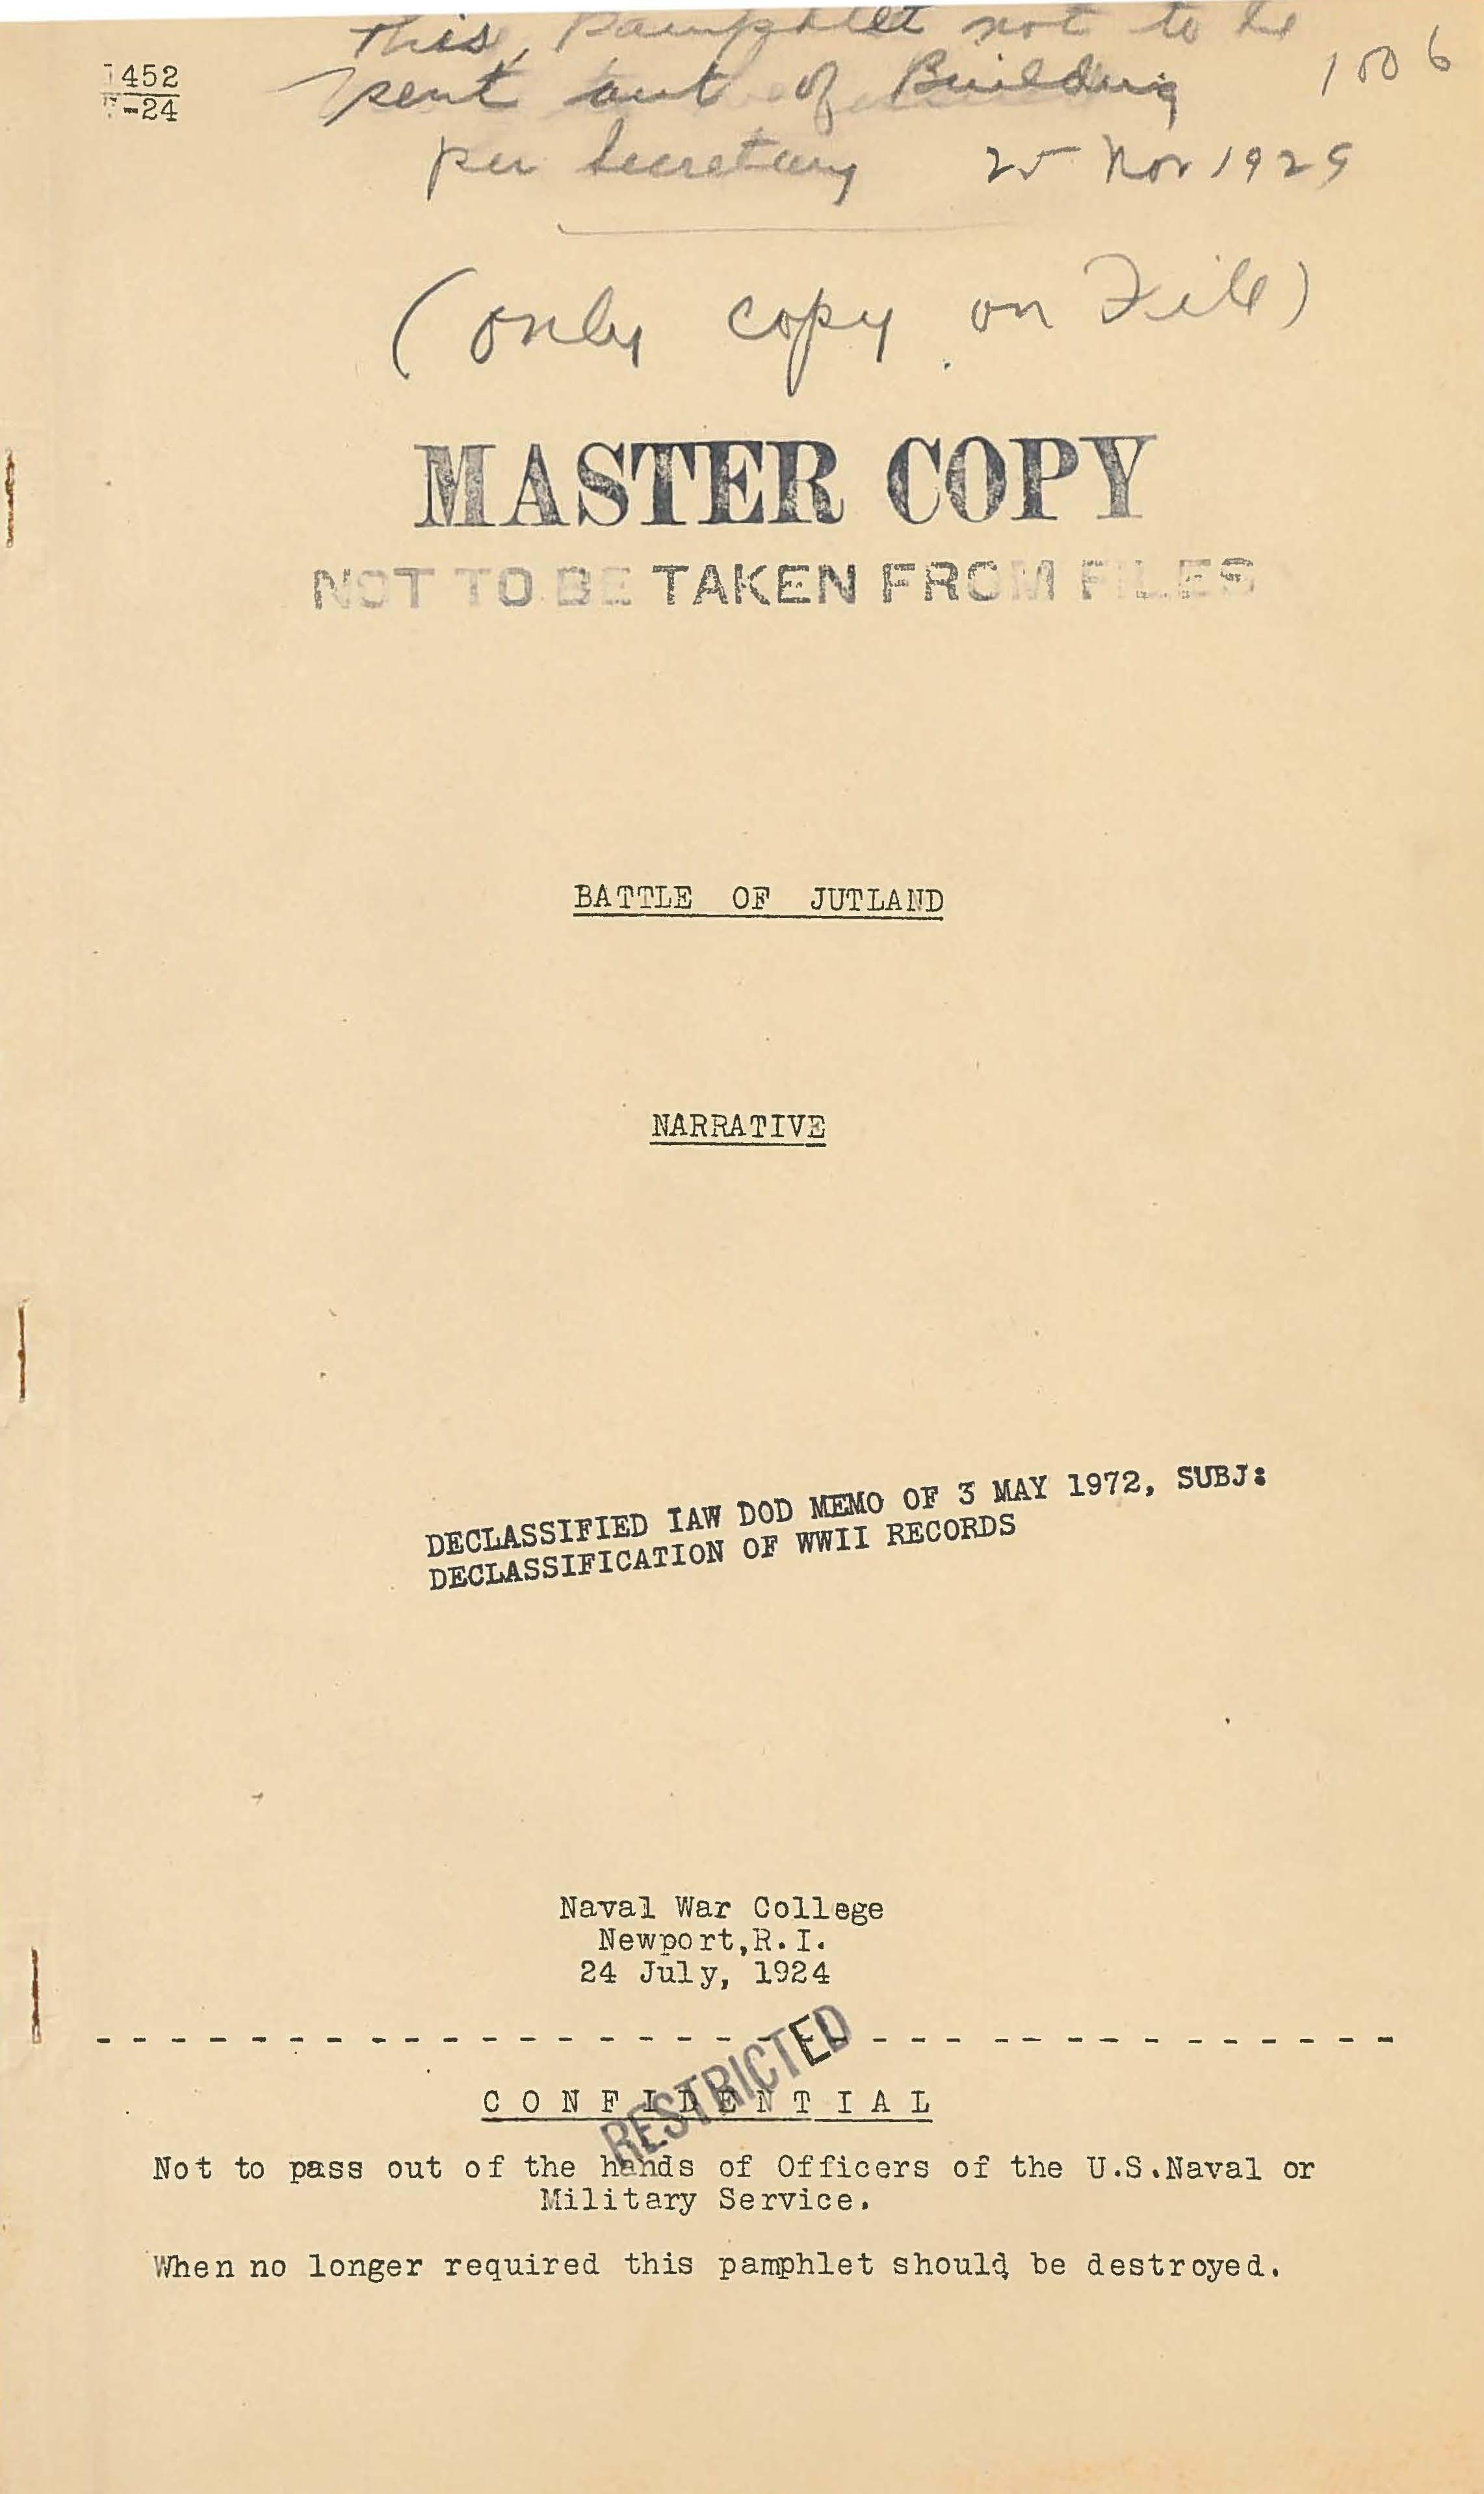 Battle of Jutland - Narrative